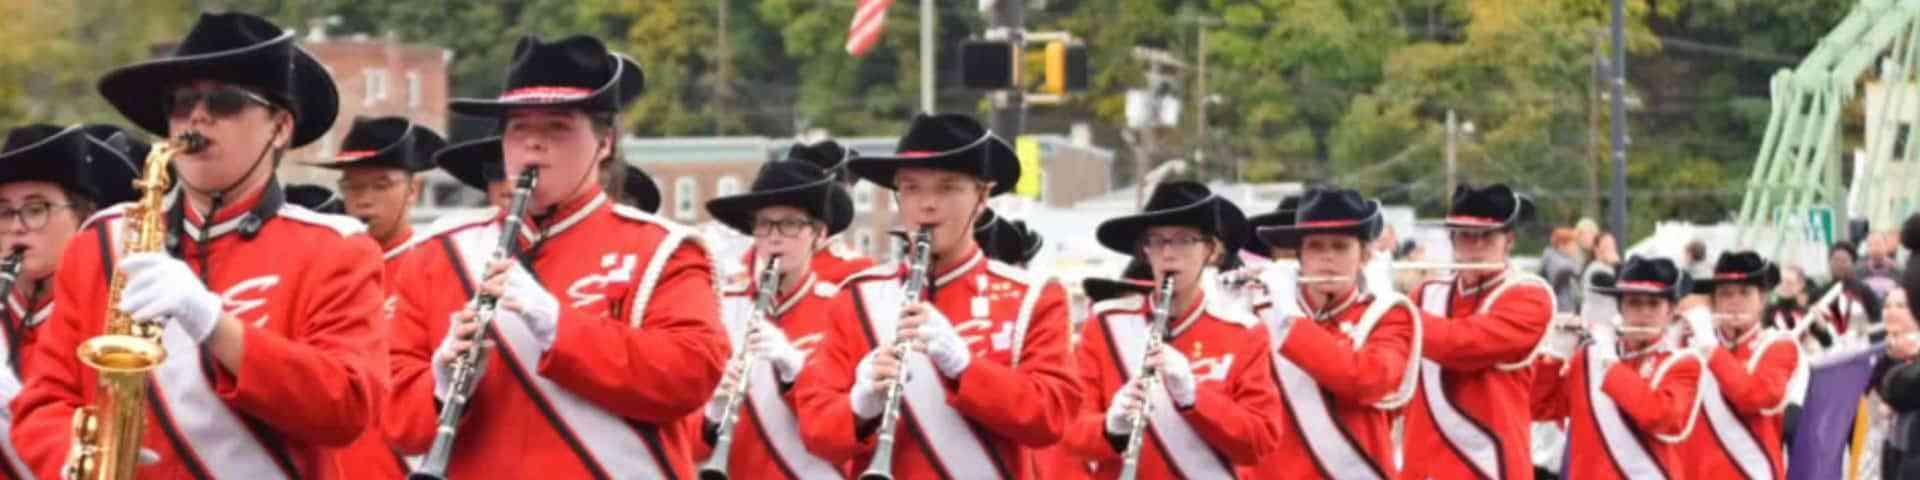 "Band members marching across the Easton ""Free Bridge."""